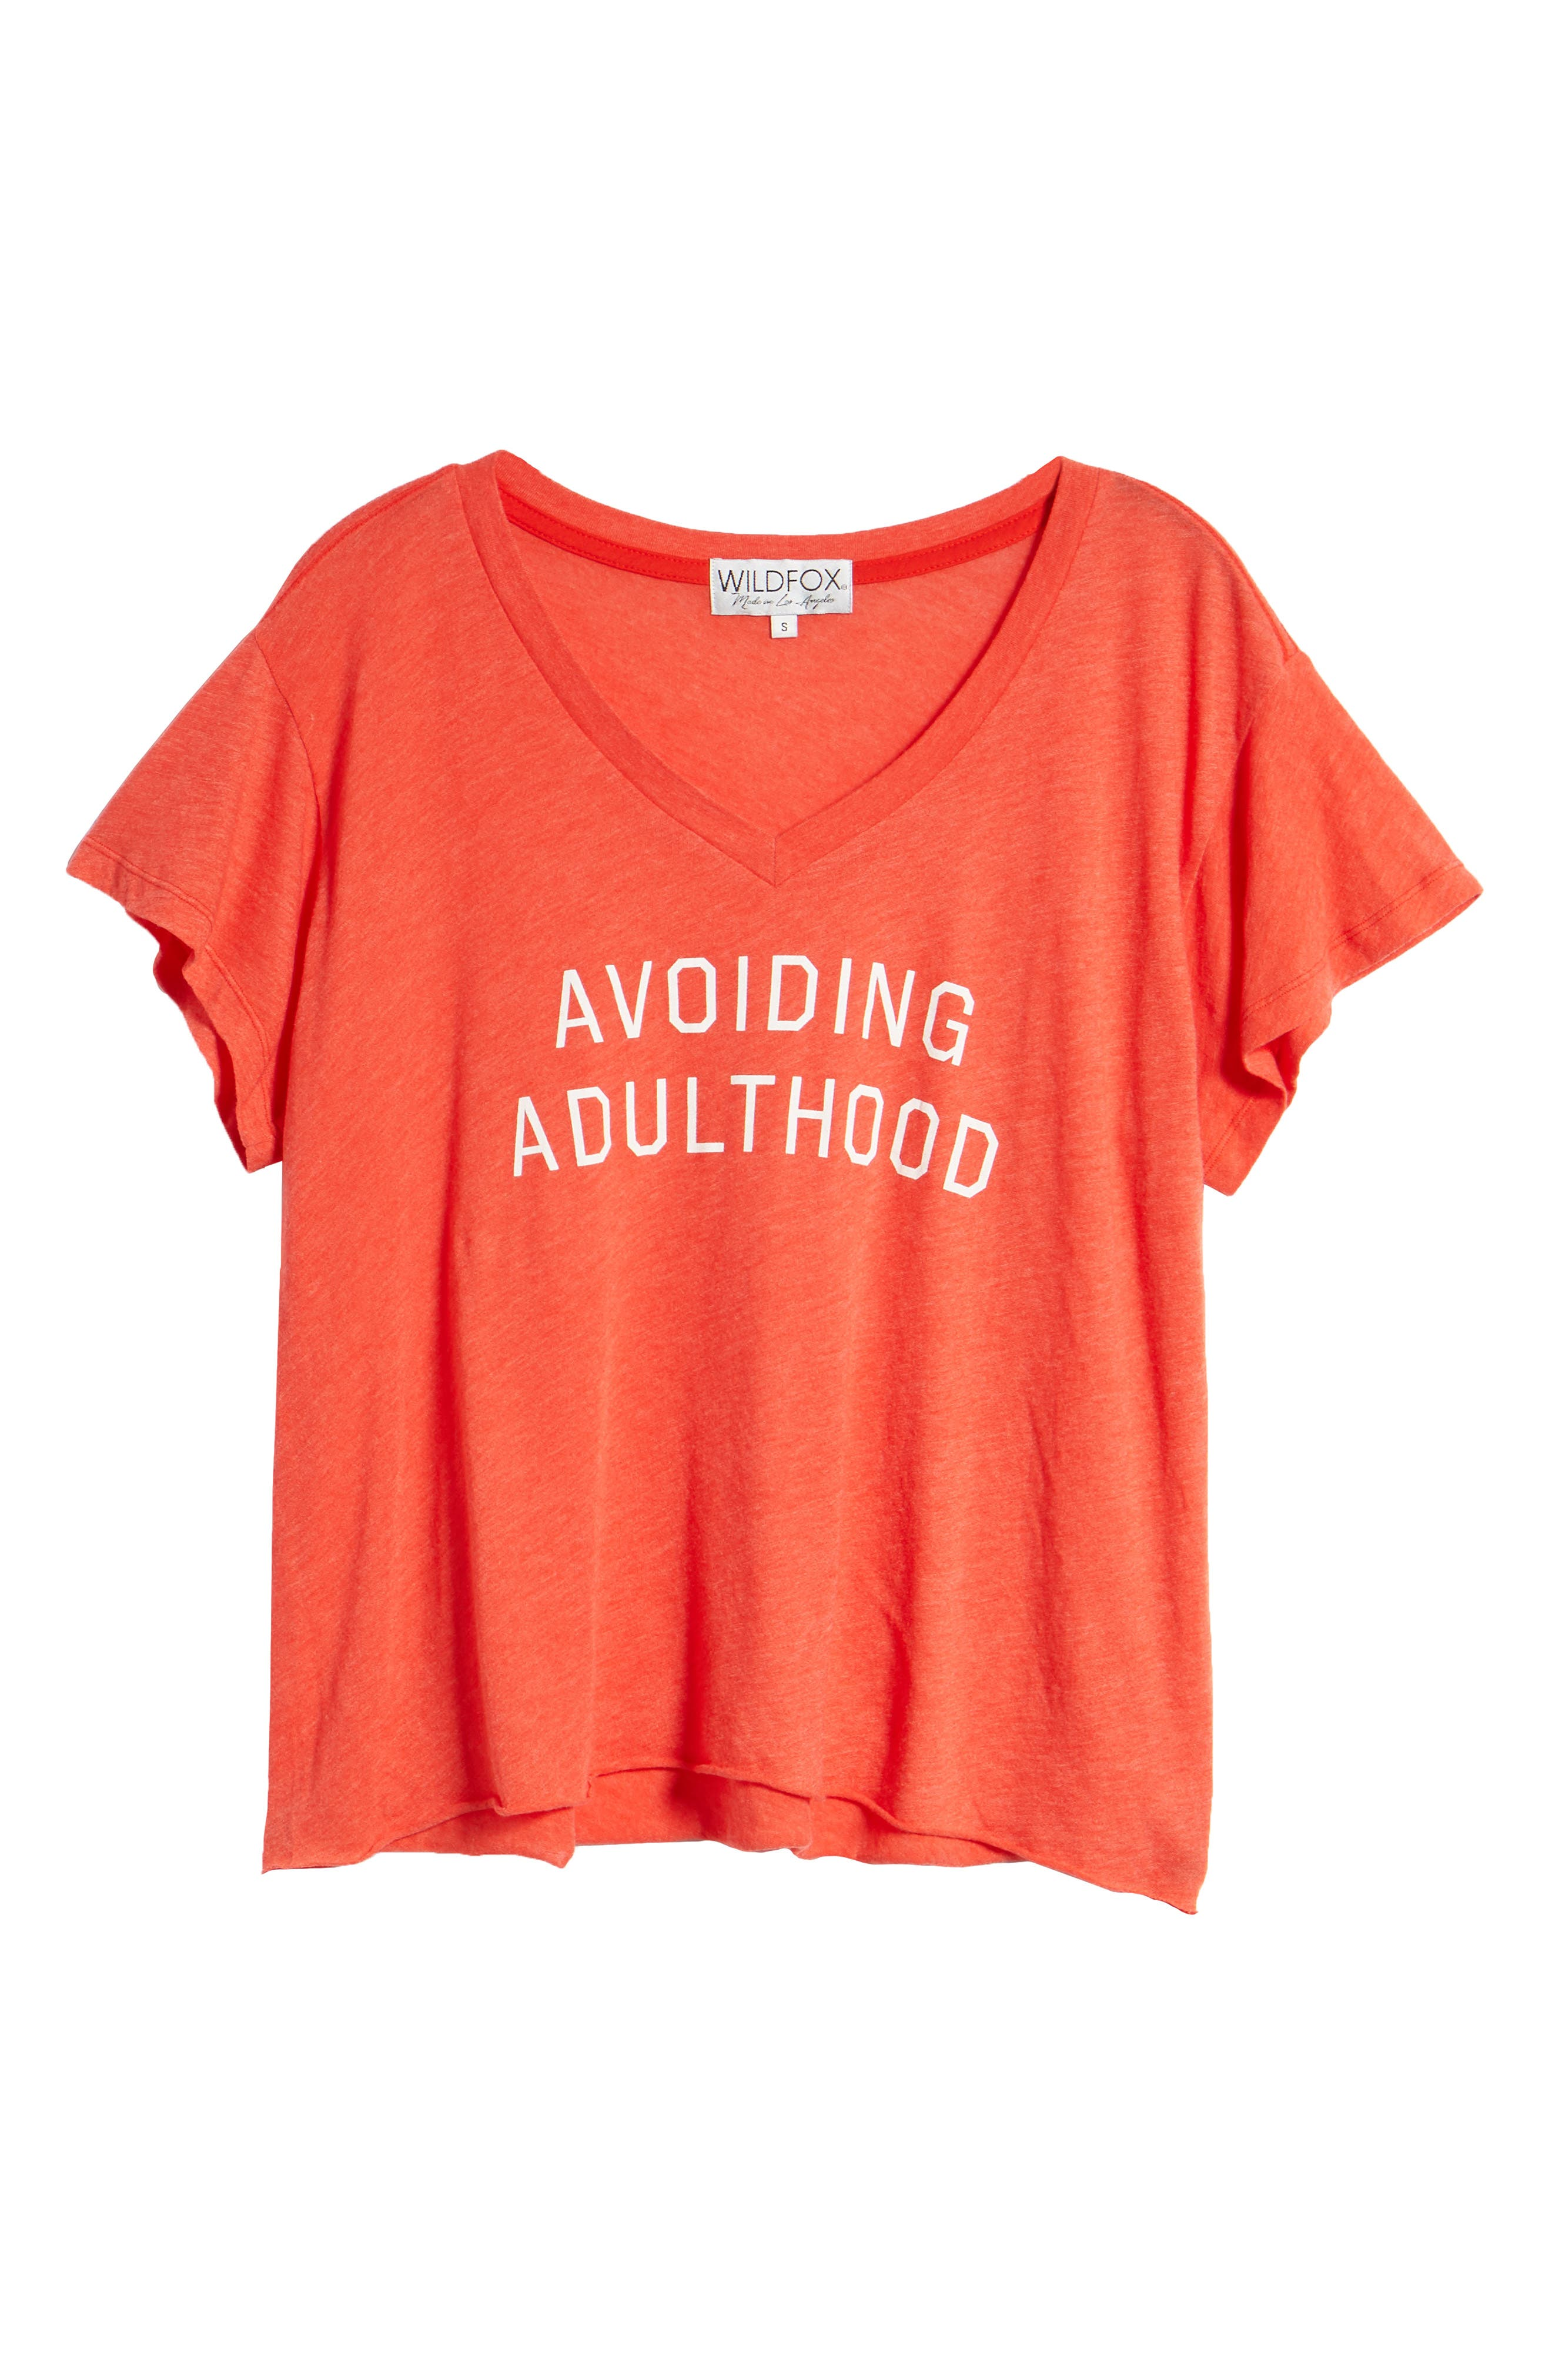 Avoiding Adulthood Romeo Tee,                             Alternate thumbnail 6, color,                             600